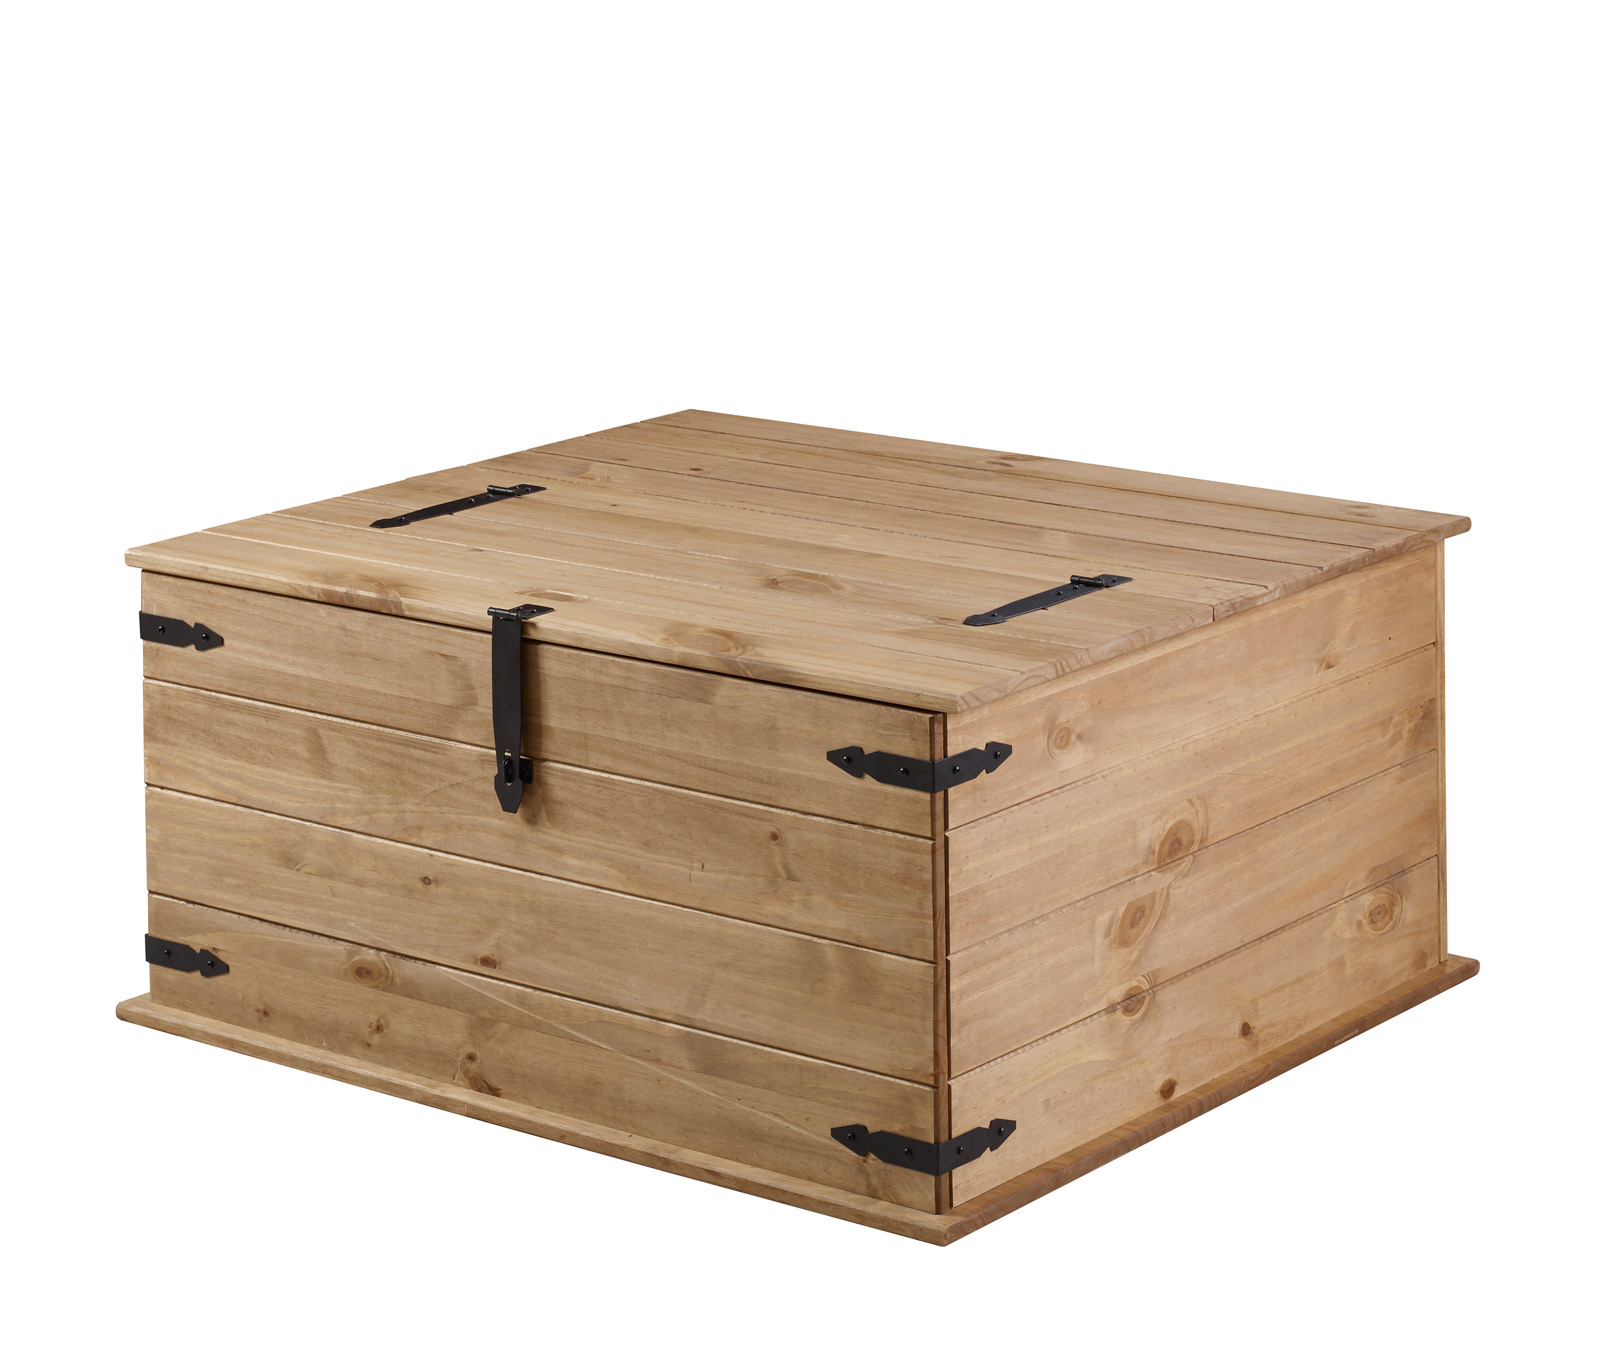 sam mexico truhen couchtisch 92 x 45 x 87 cm massivholz arizona demn chst. Black Bedroom Furniture Sets. Home Design Ideas